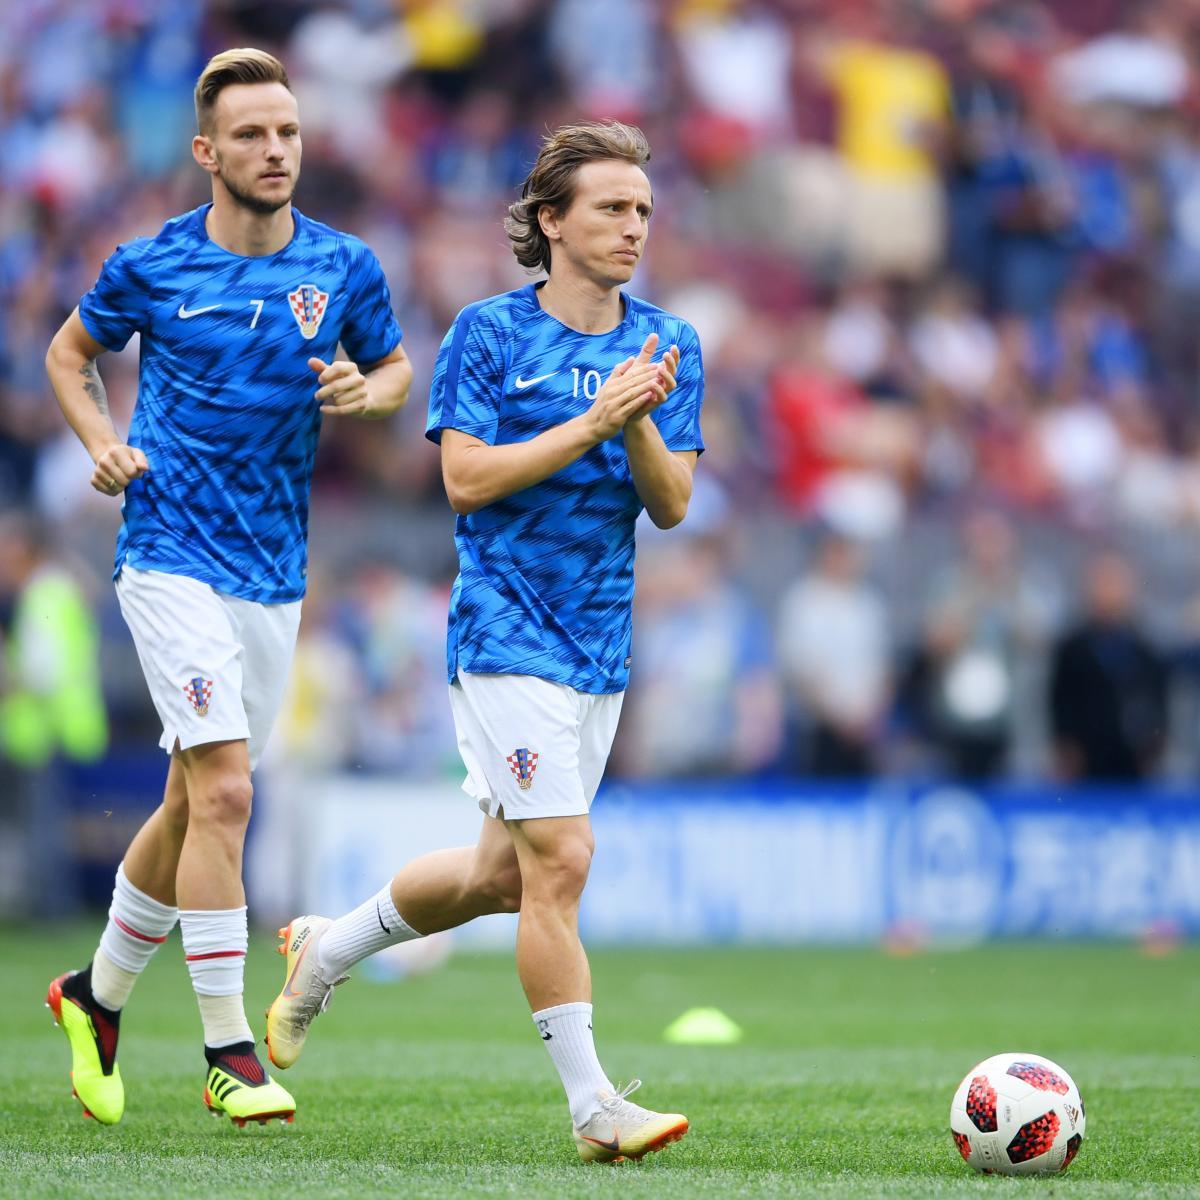 Ivan Rakitic Backs Luka Modric to Win Any Prize Lionel Messi Cannot